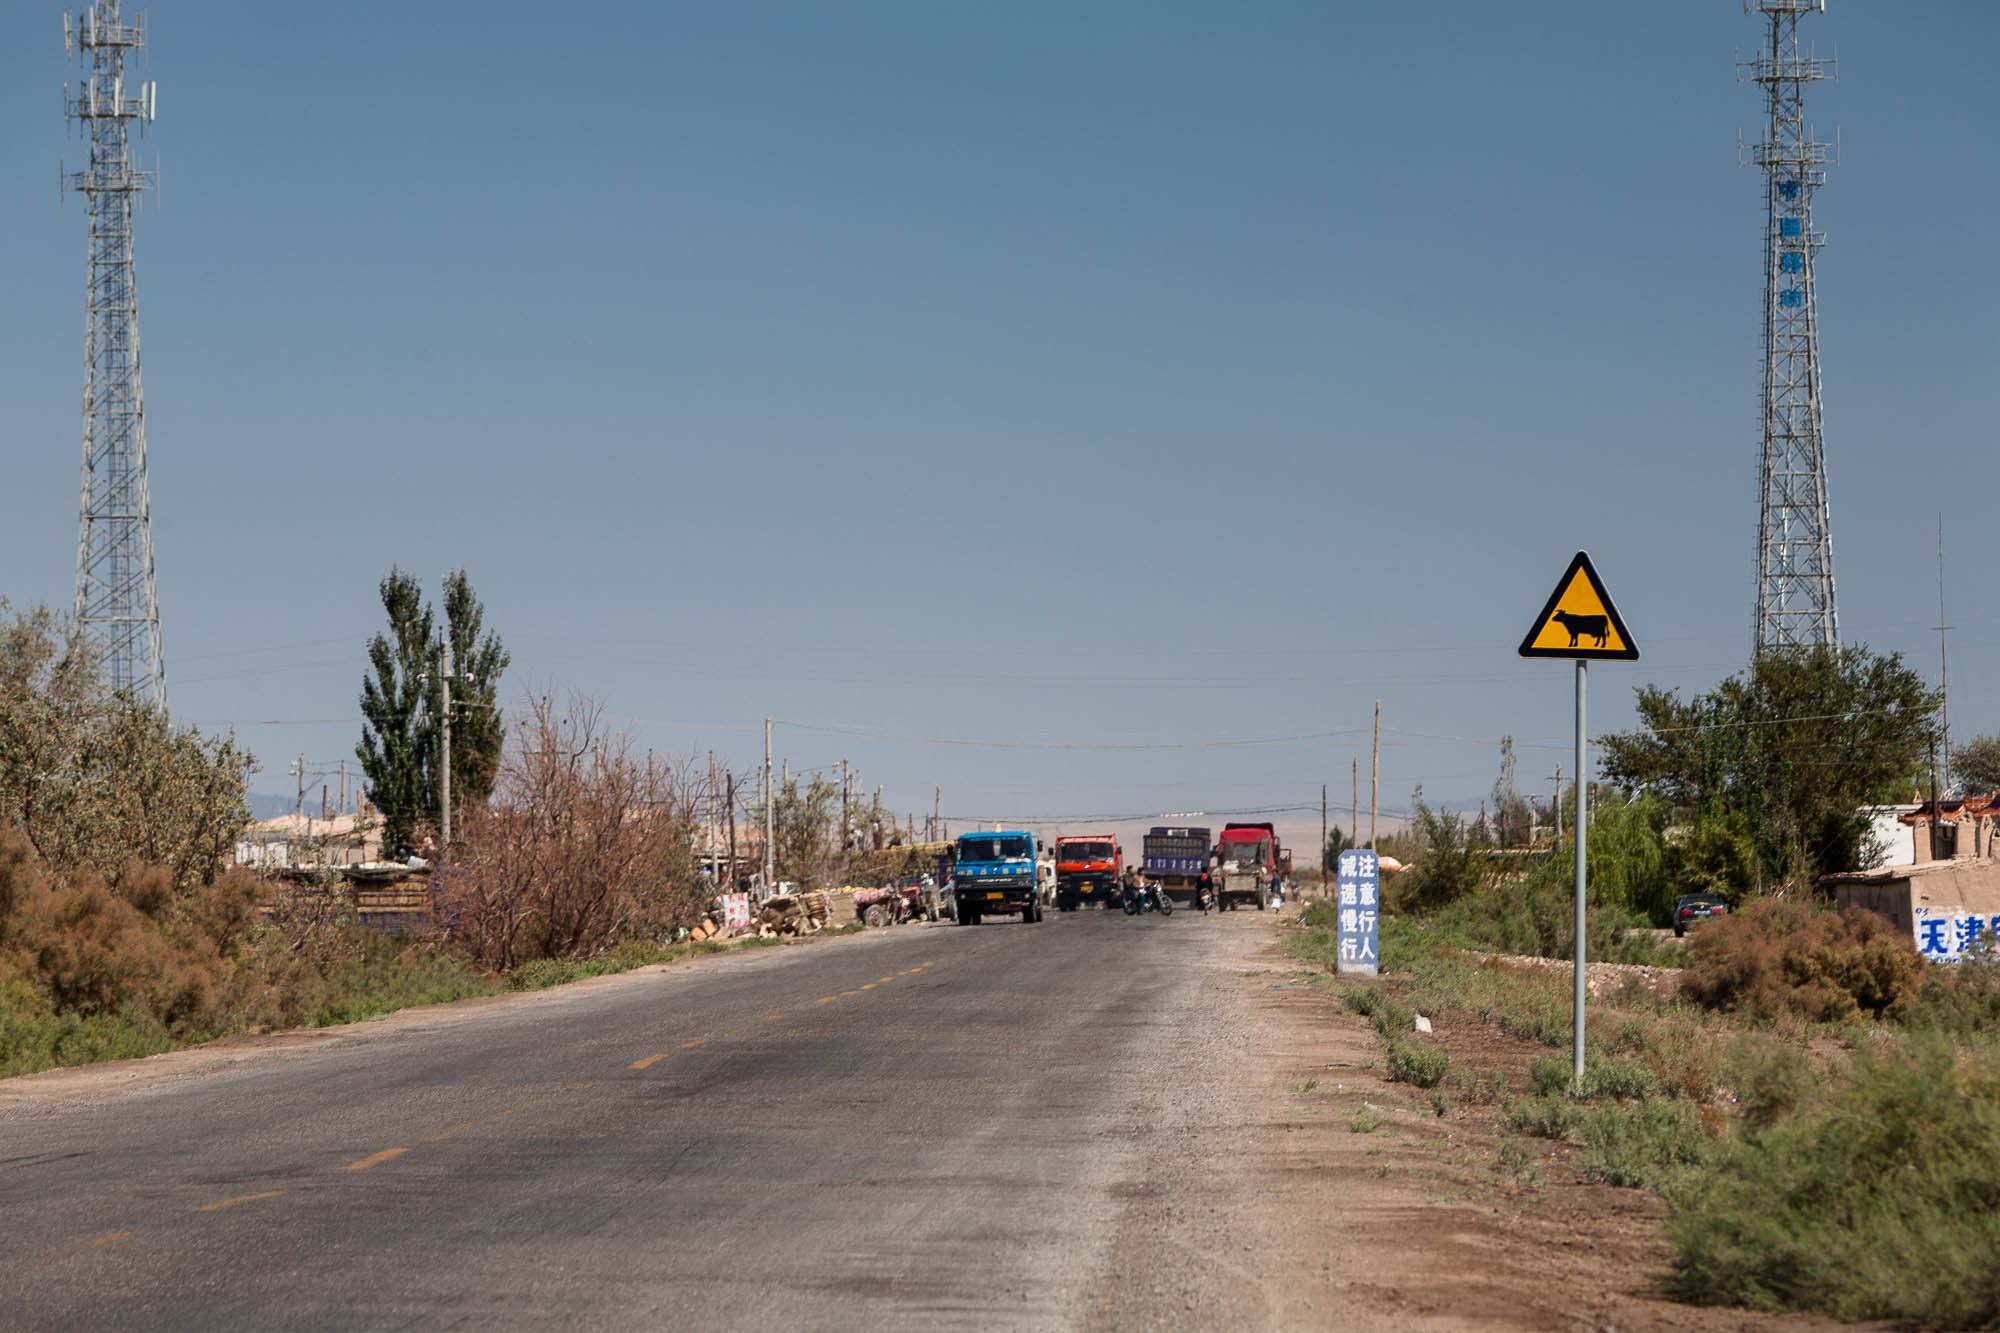 Xihu village